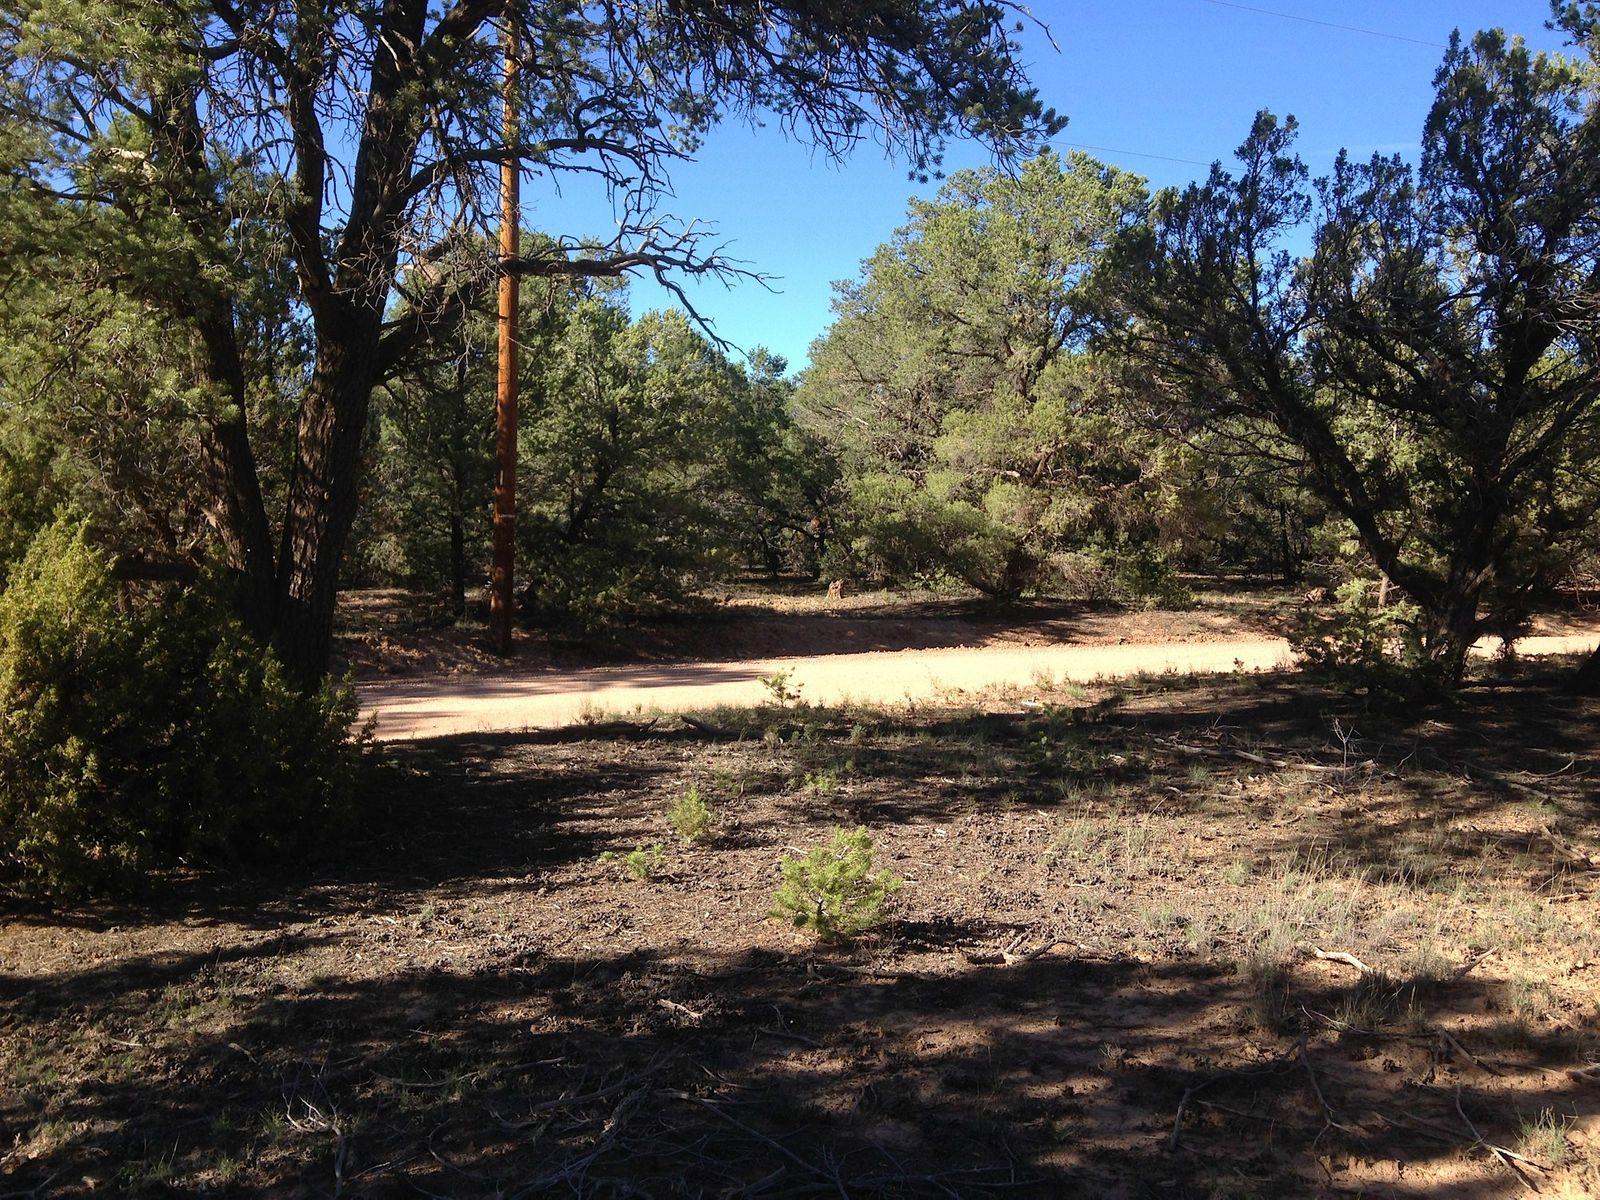 Apache Ridge, Tract 3-B; Mescalero Trail